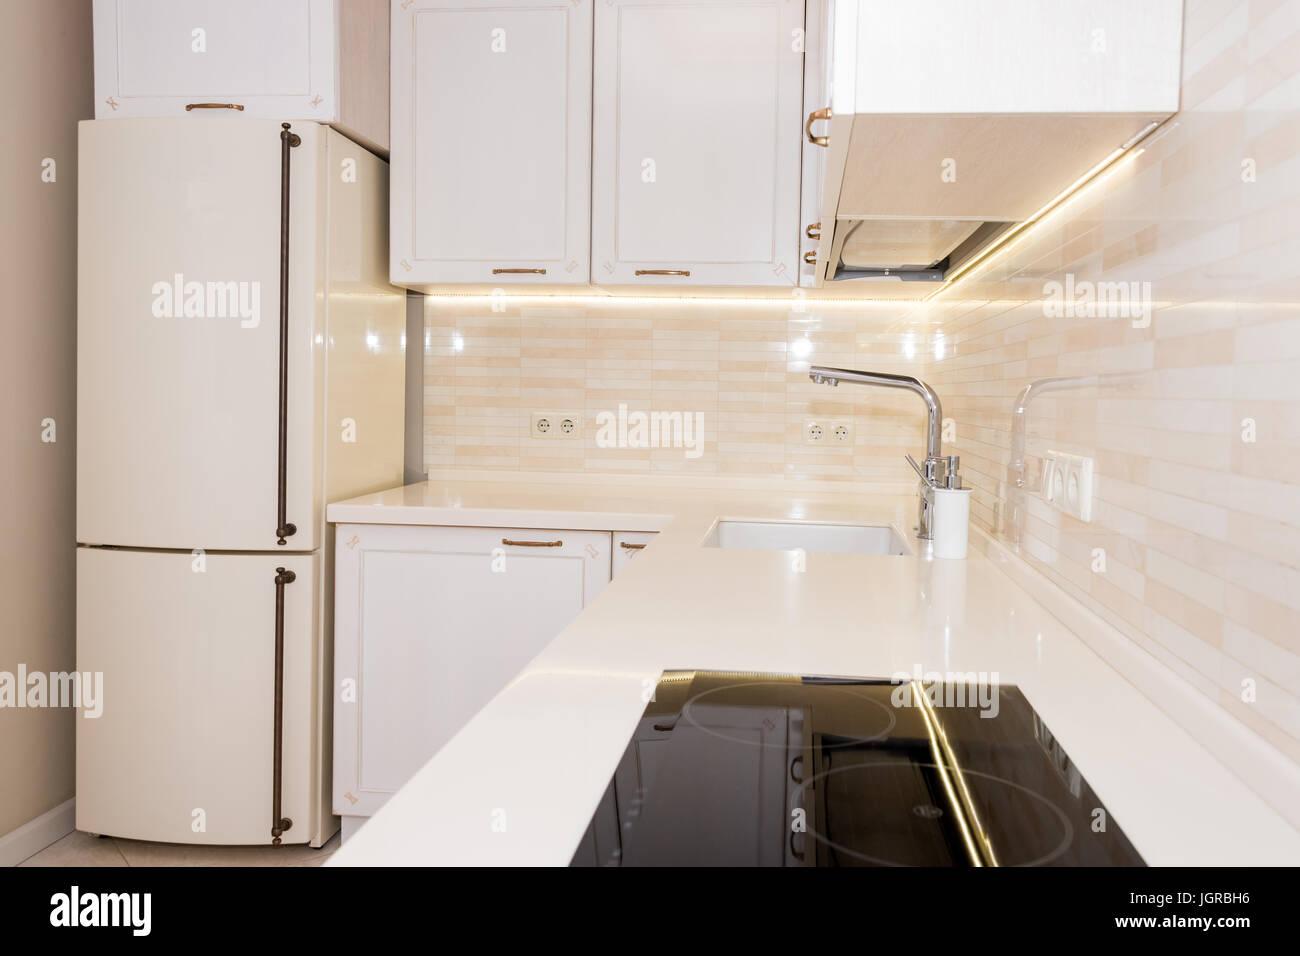 Interni Moderni Case Di Lusso : Moderne e luminose pulire la cucina interna in una casa di lusso